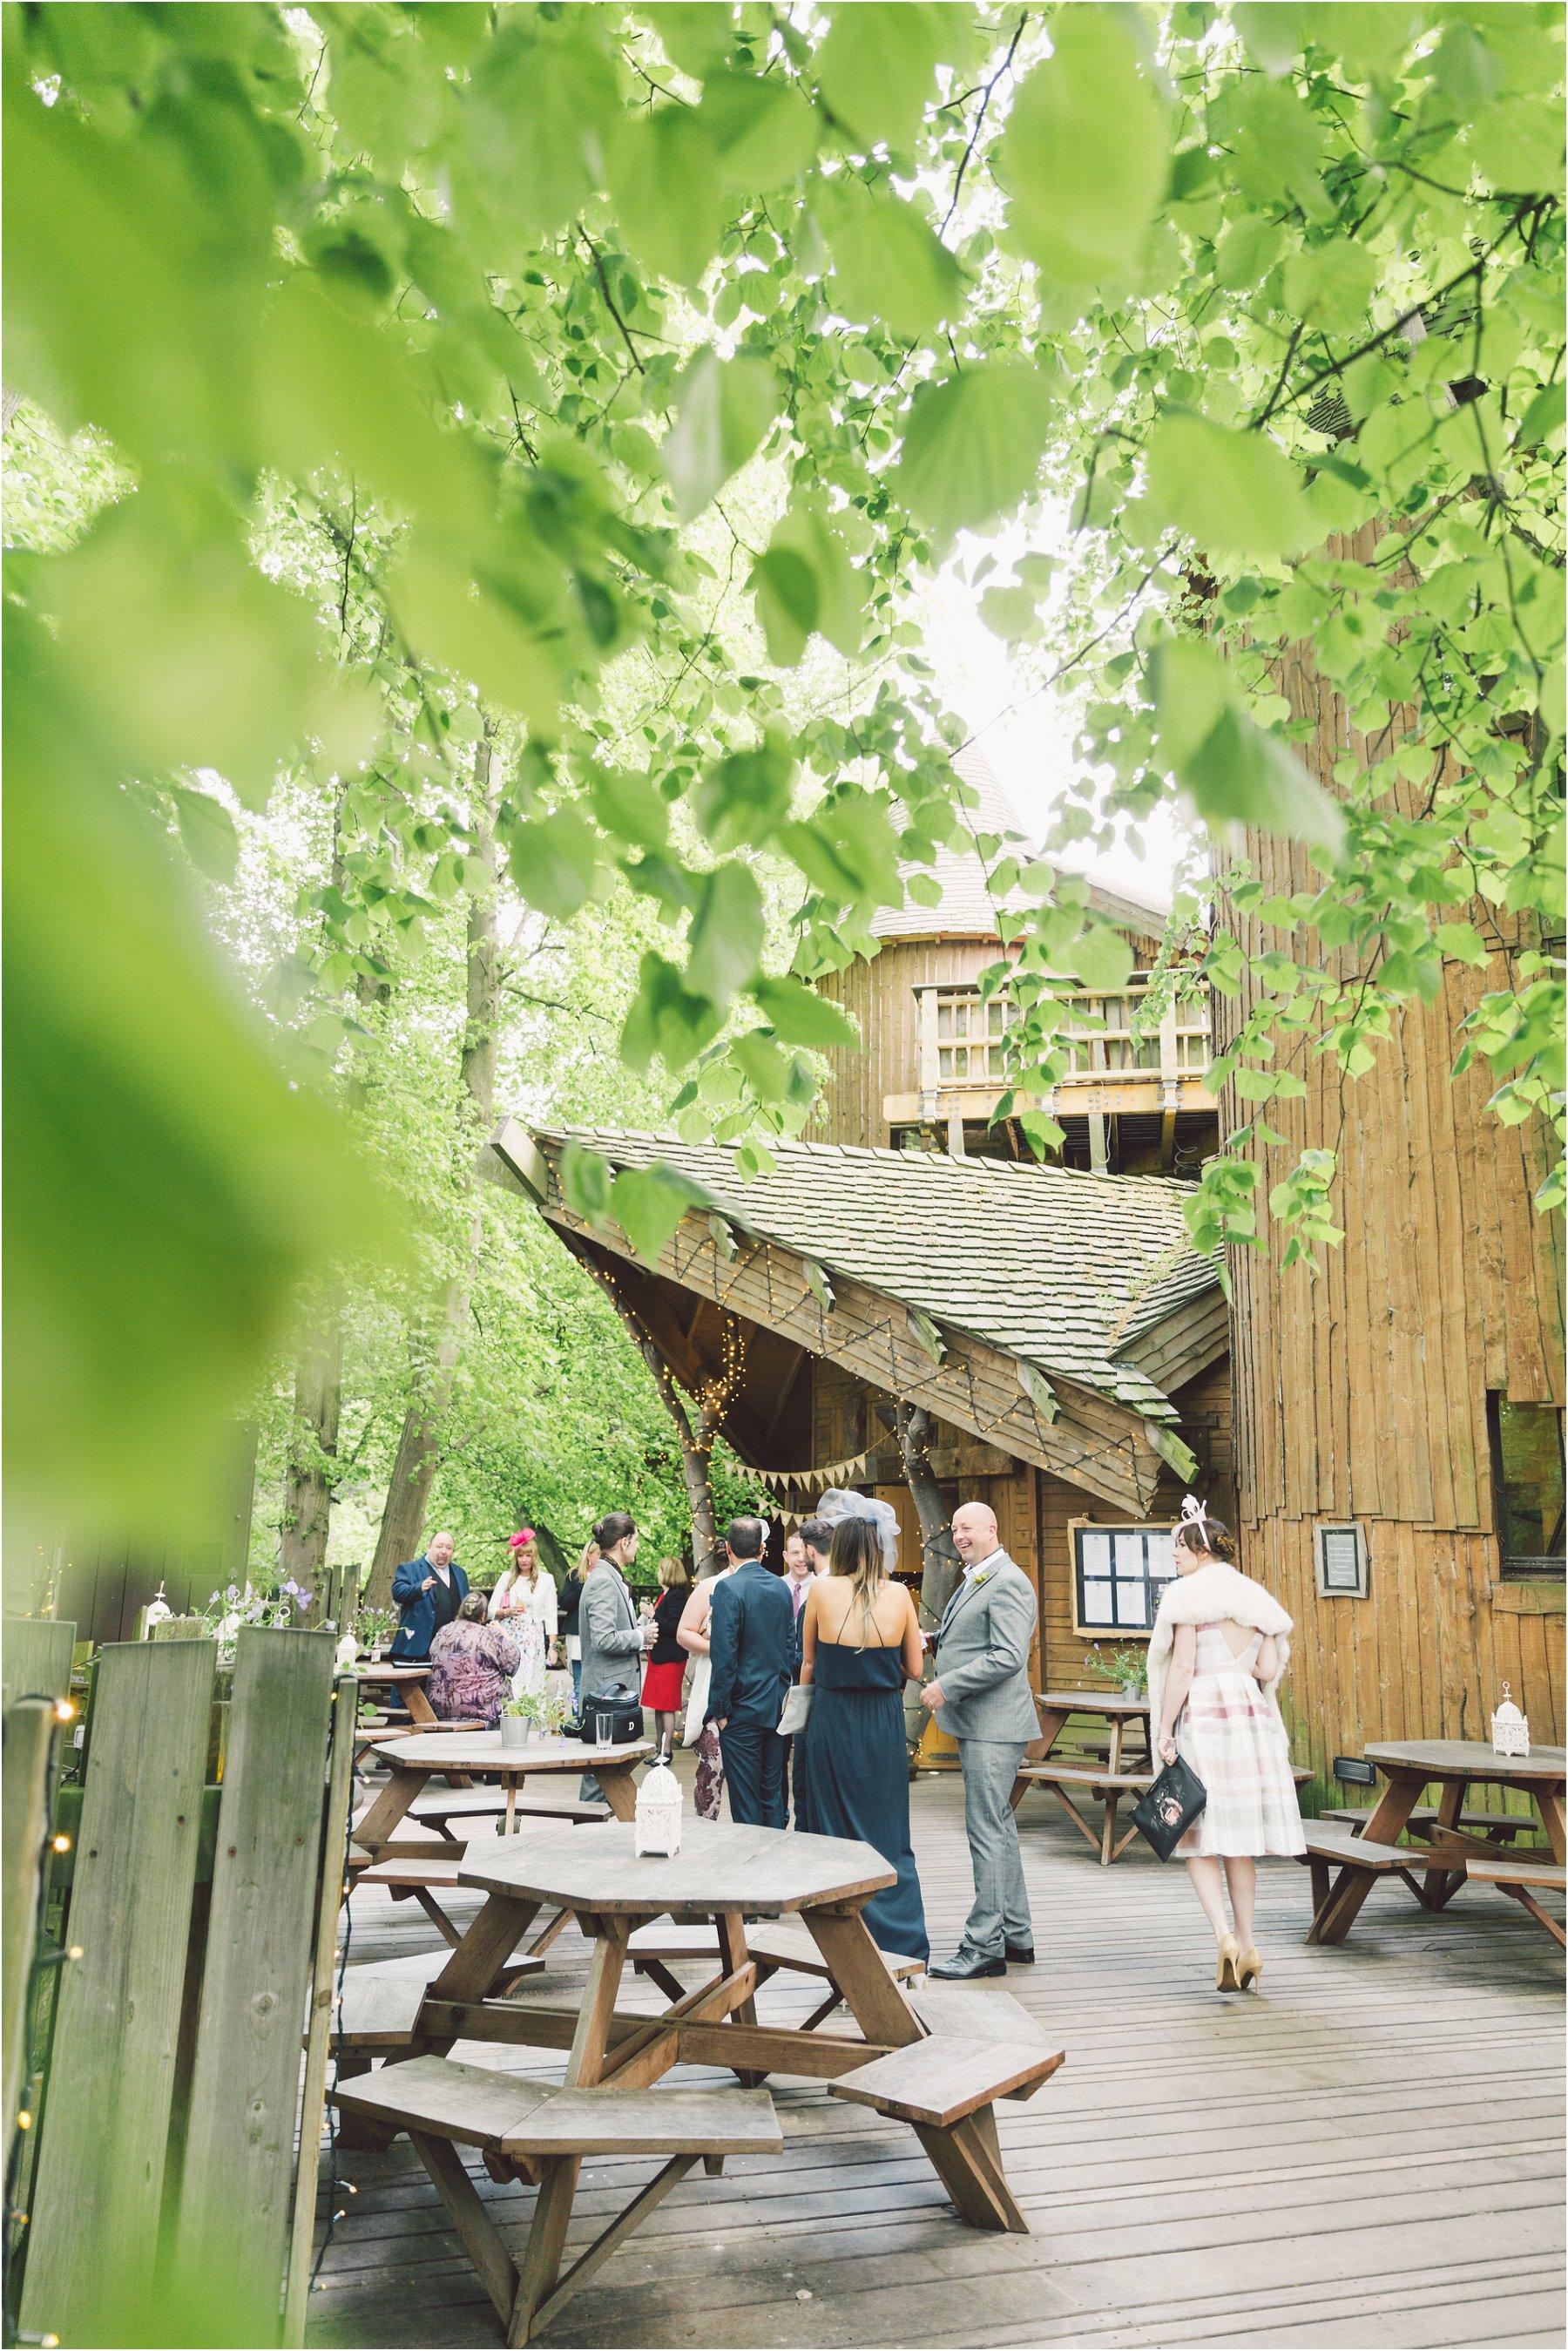 eve.photography.relaxed.creative.wedding.destination._0289.jpg